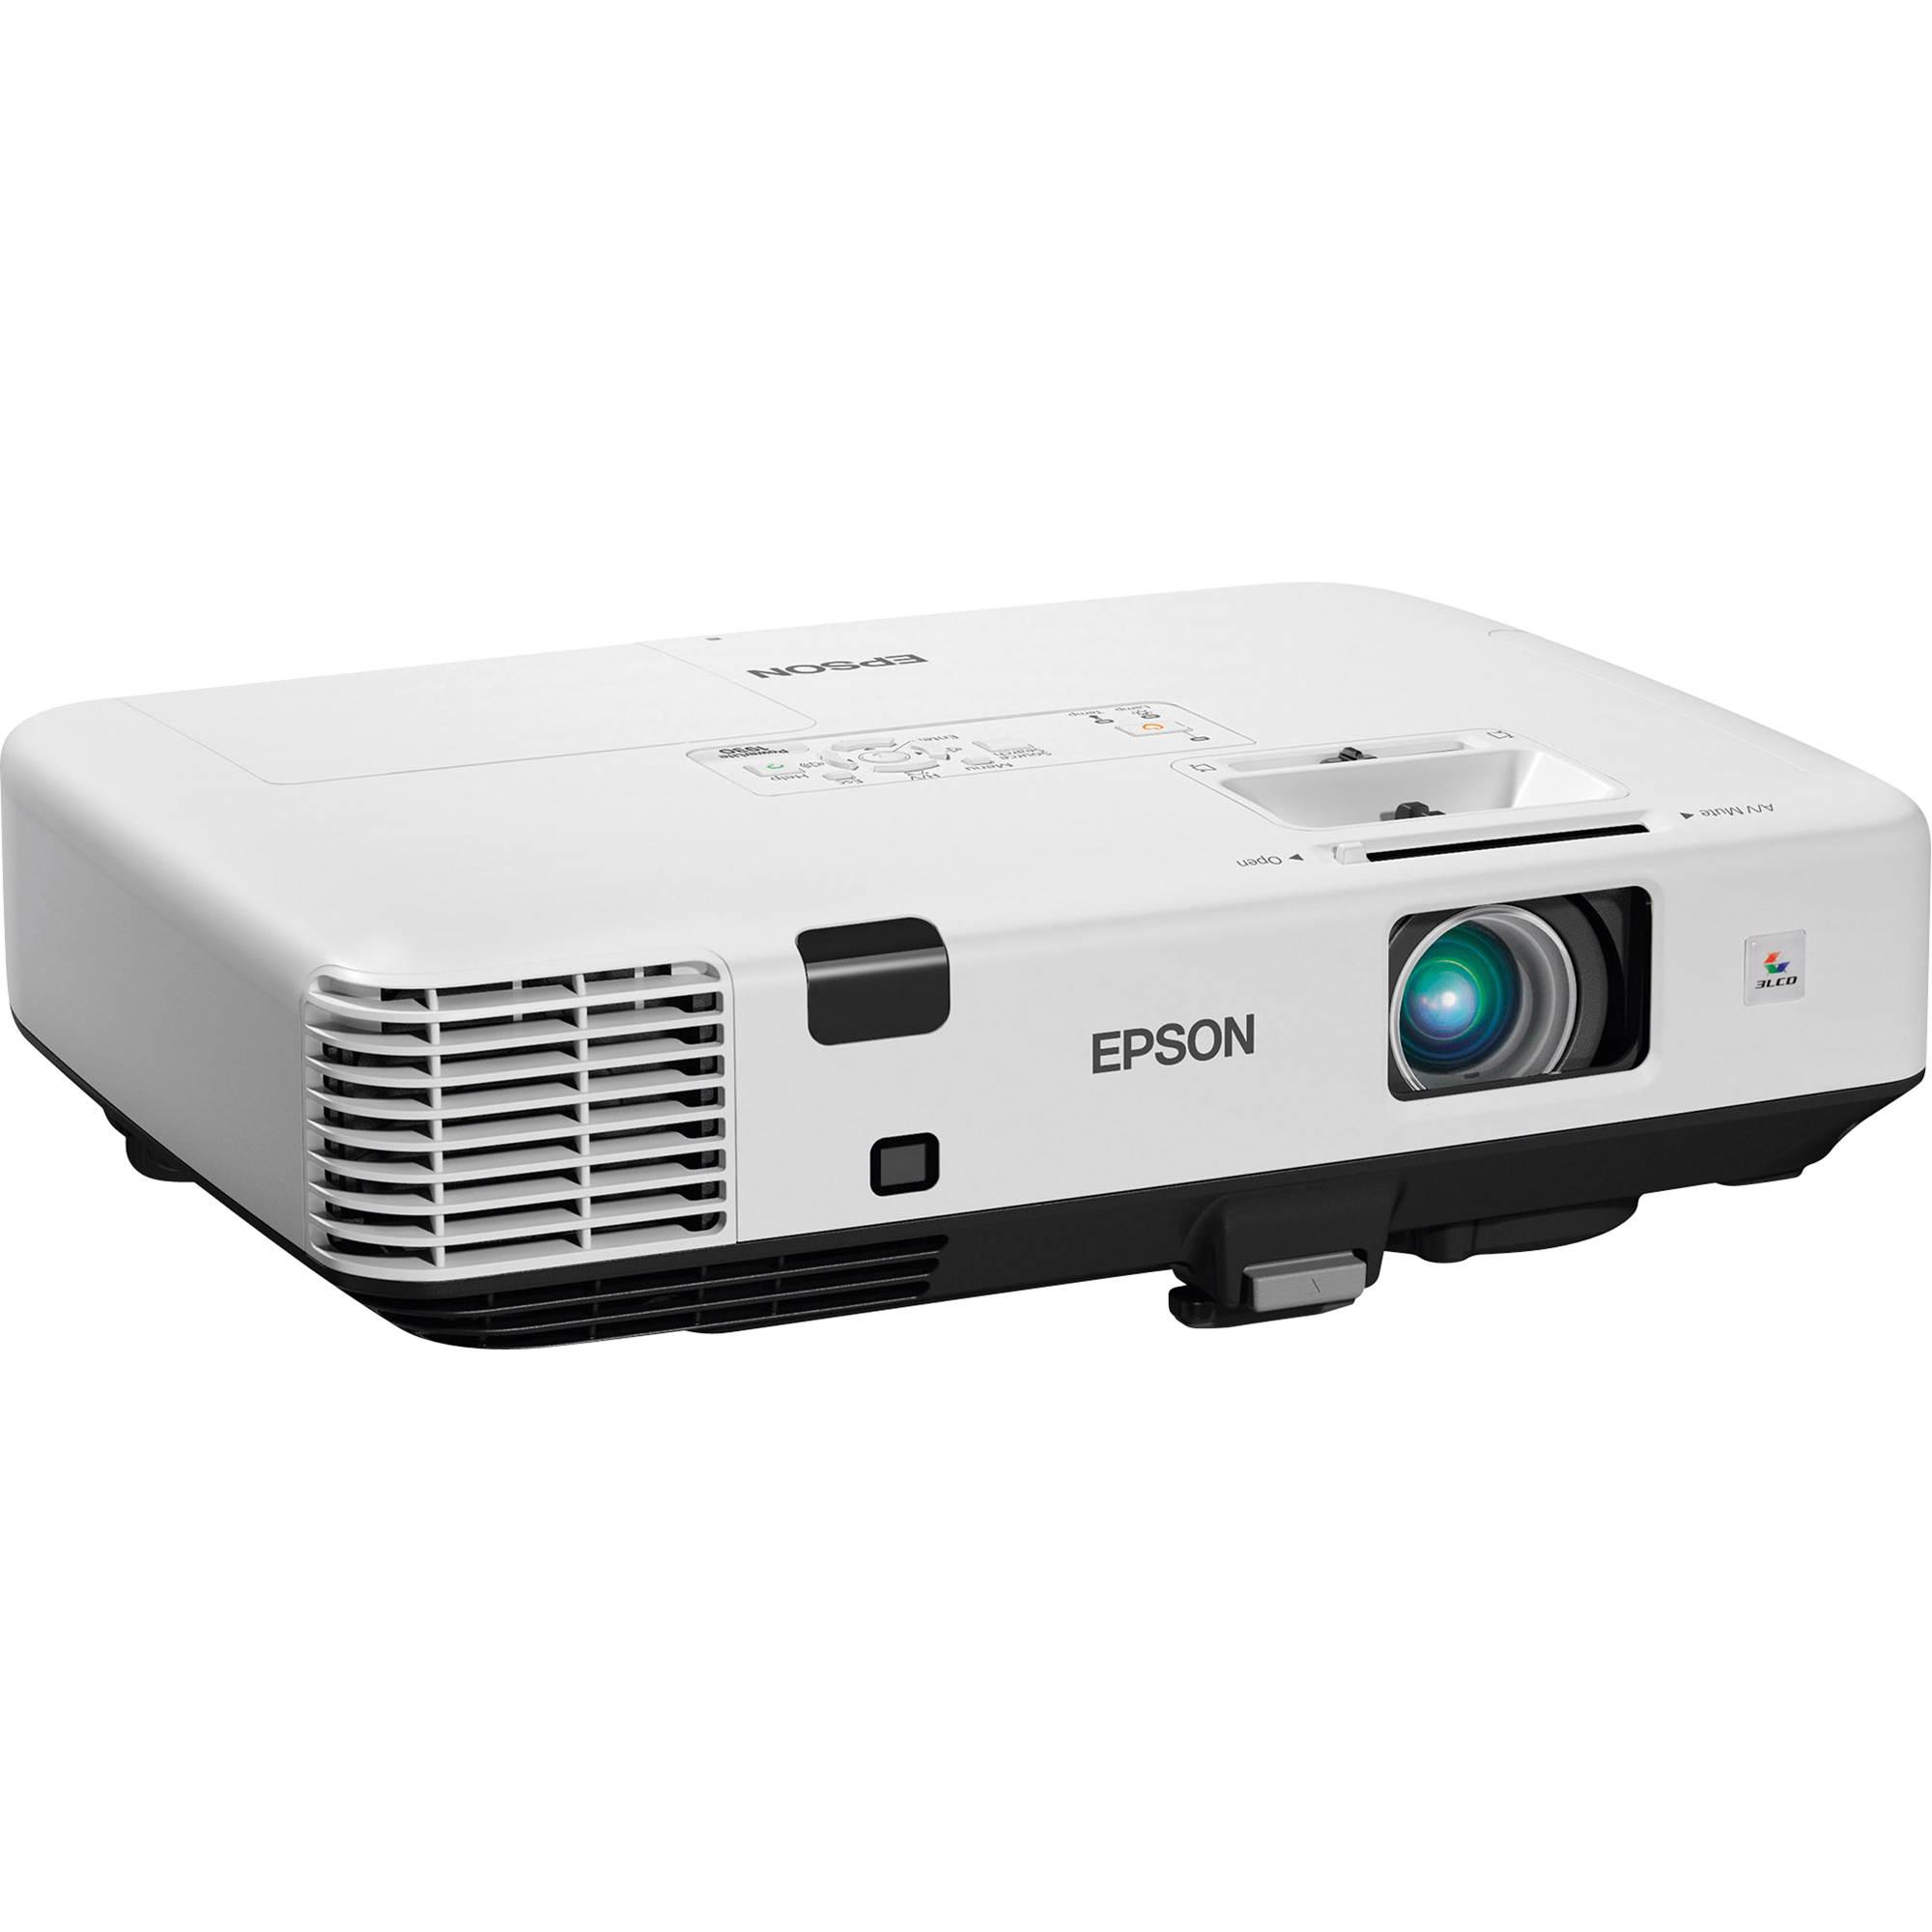 Epson Powerlite 1930 Xga 3lcd Projector V11h506020 B Amp H Photo